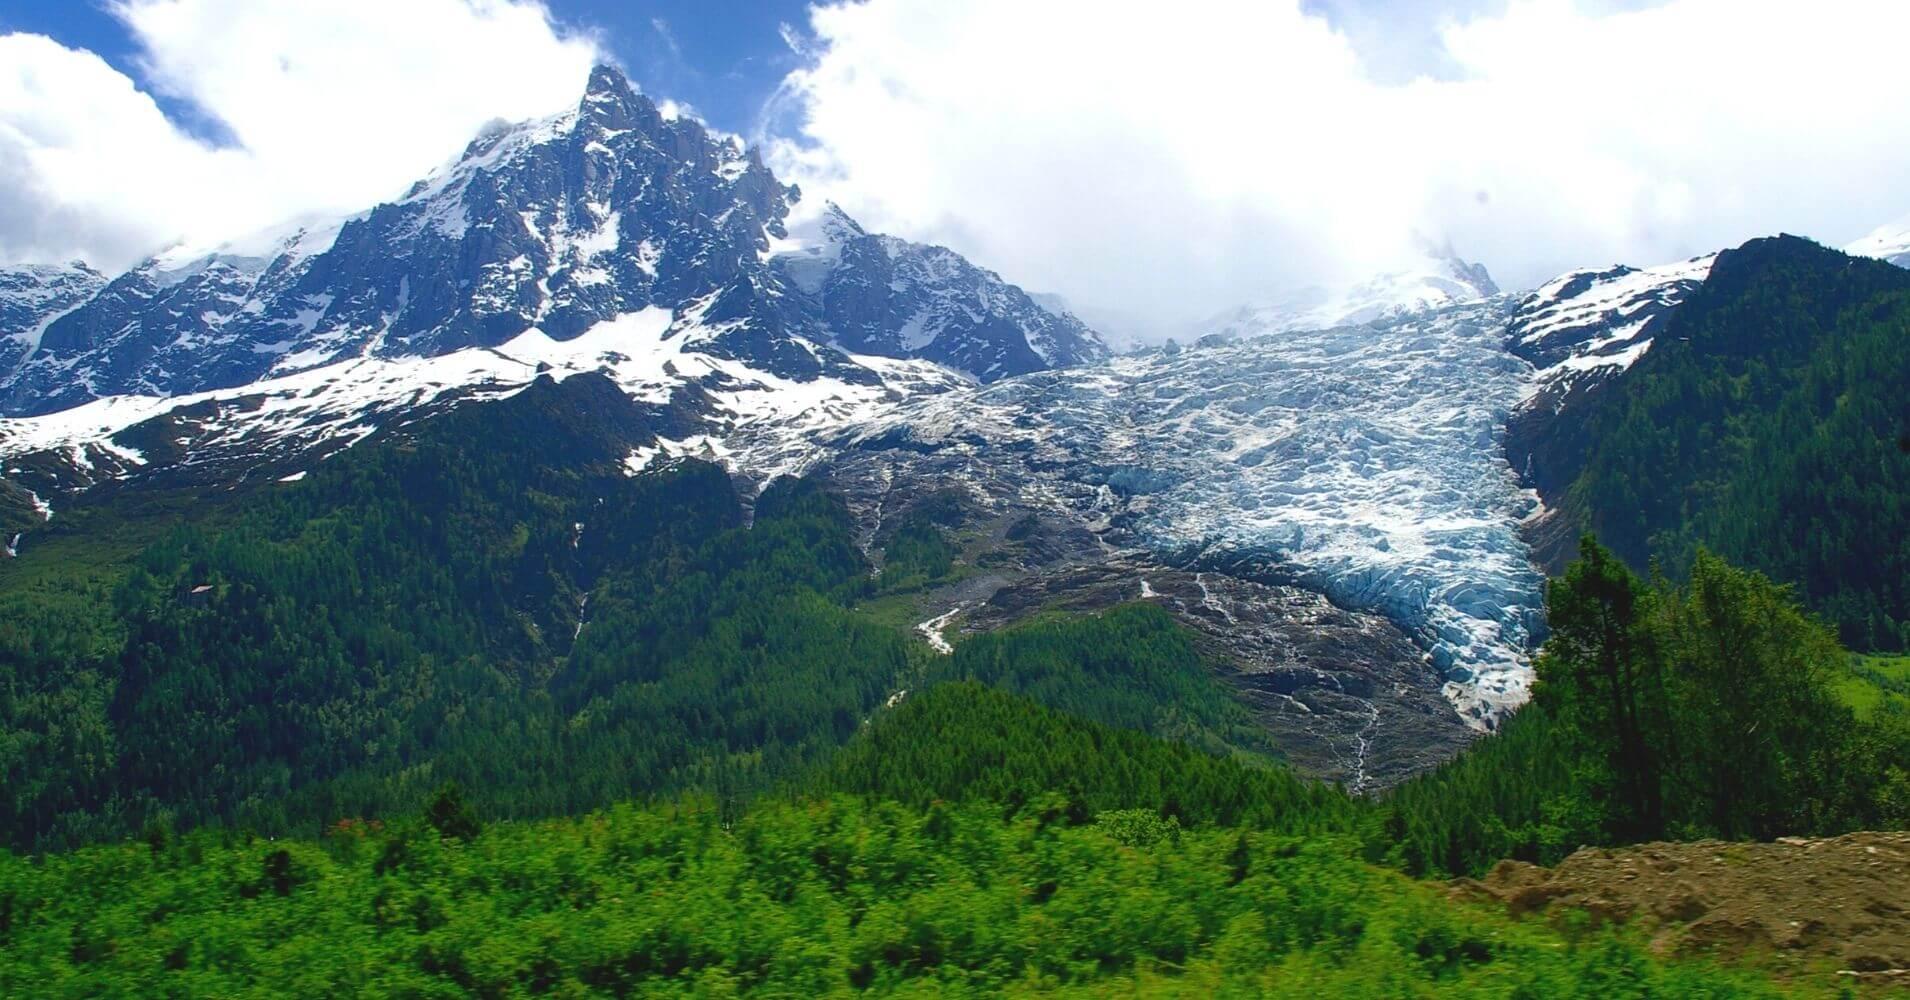 Trekking del Tour del Mont Blanc. Francia, Suiza, Italia.